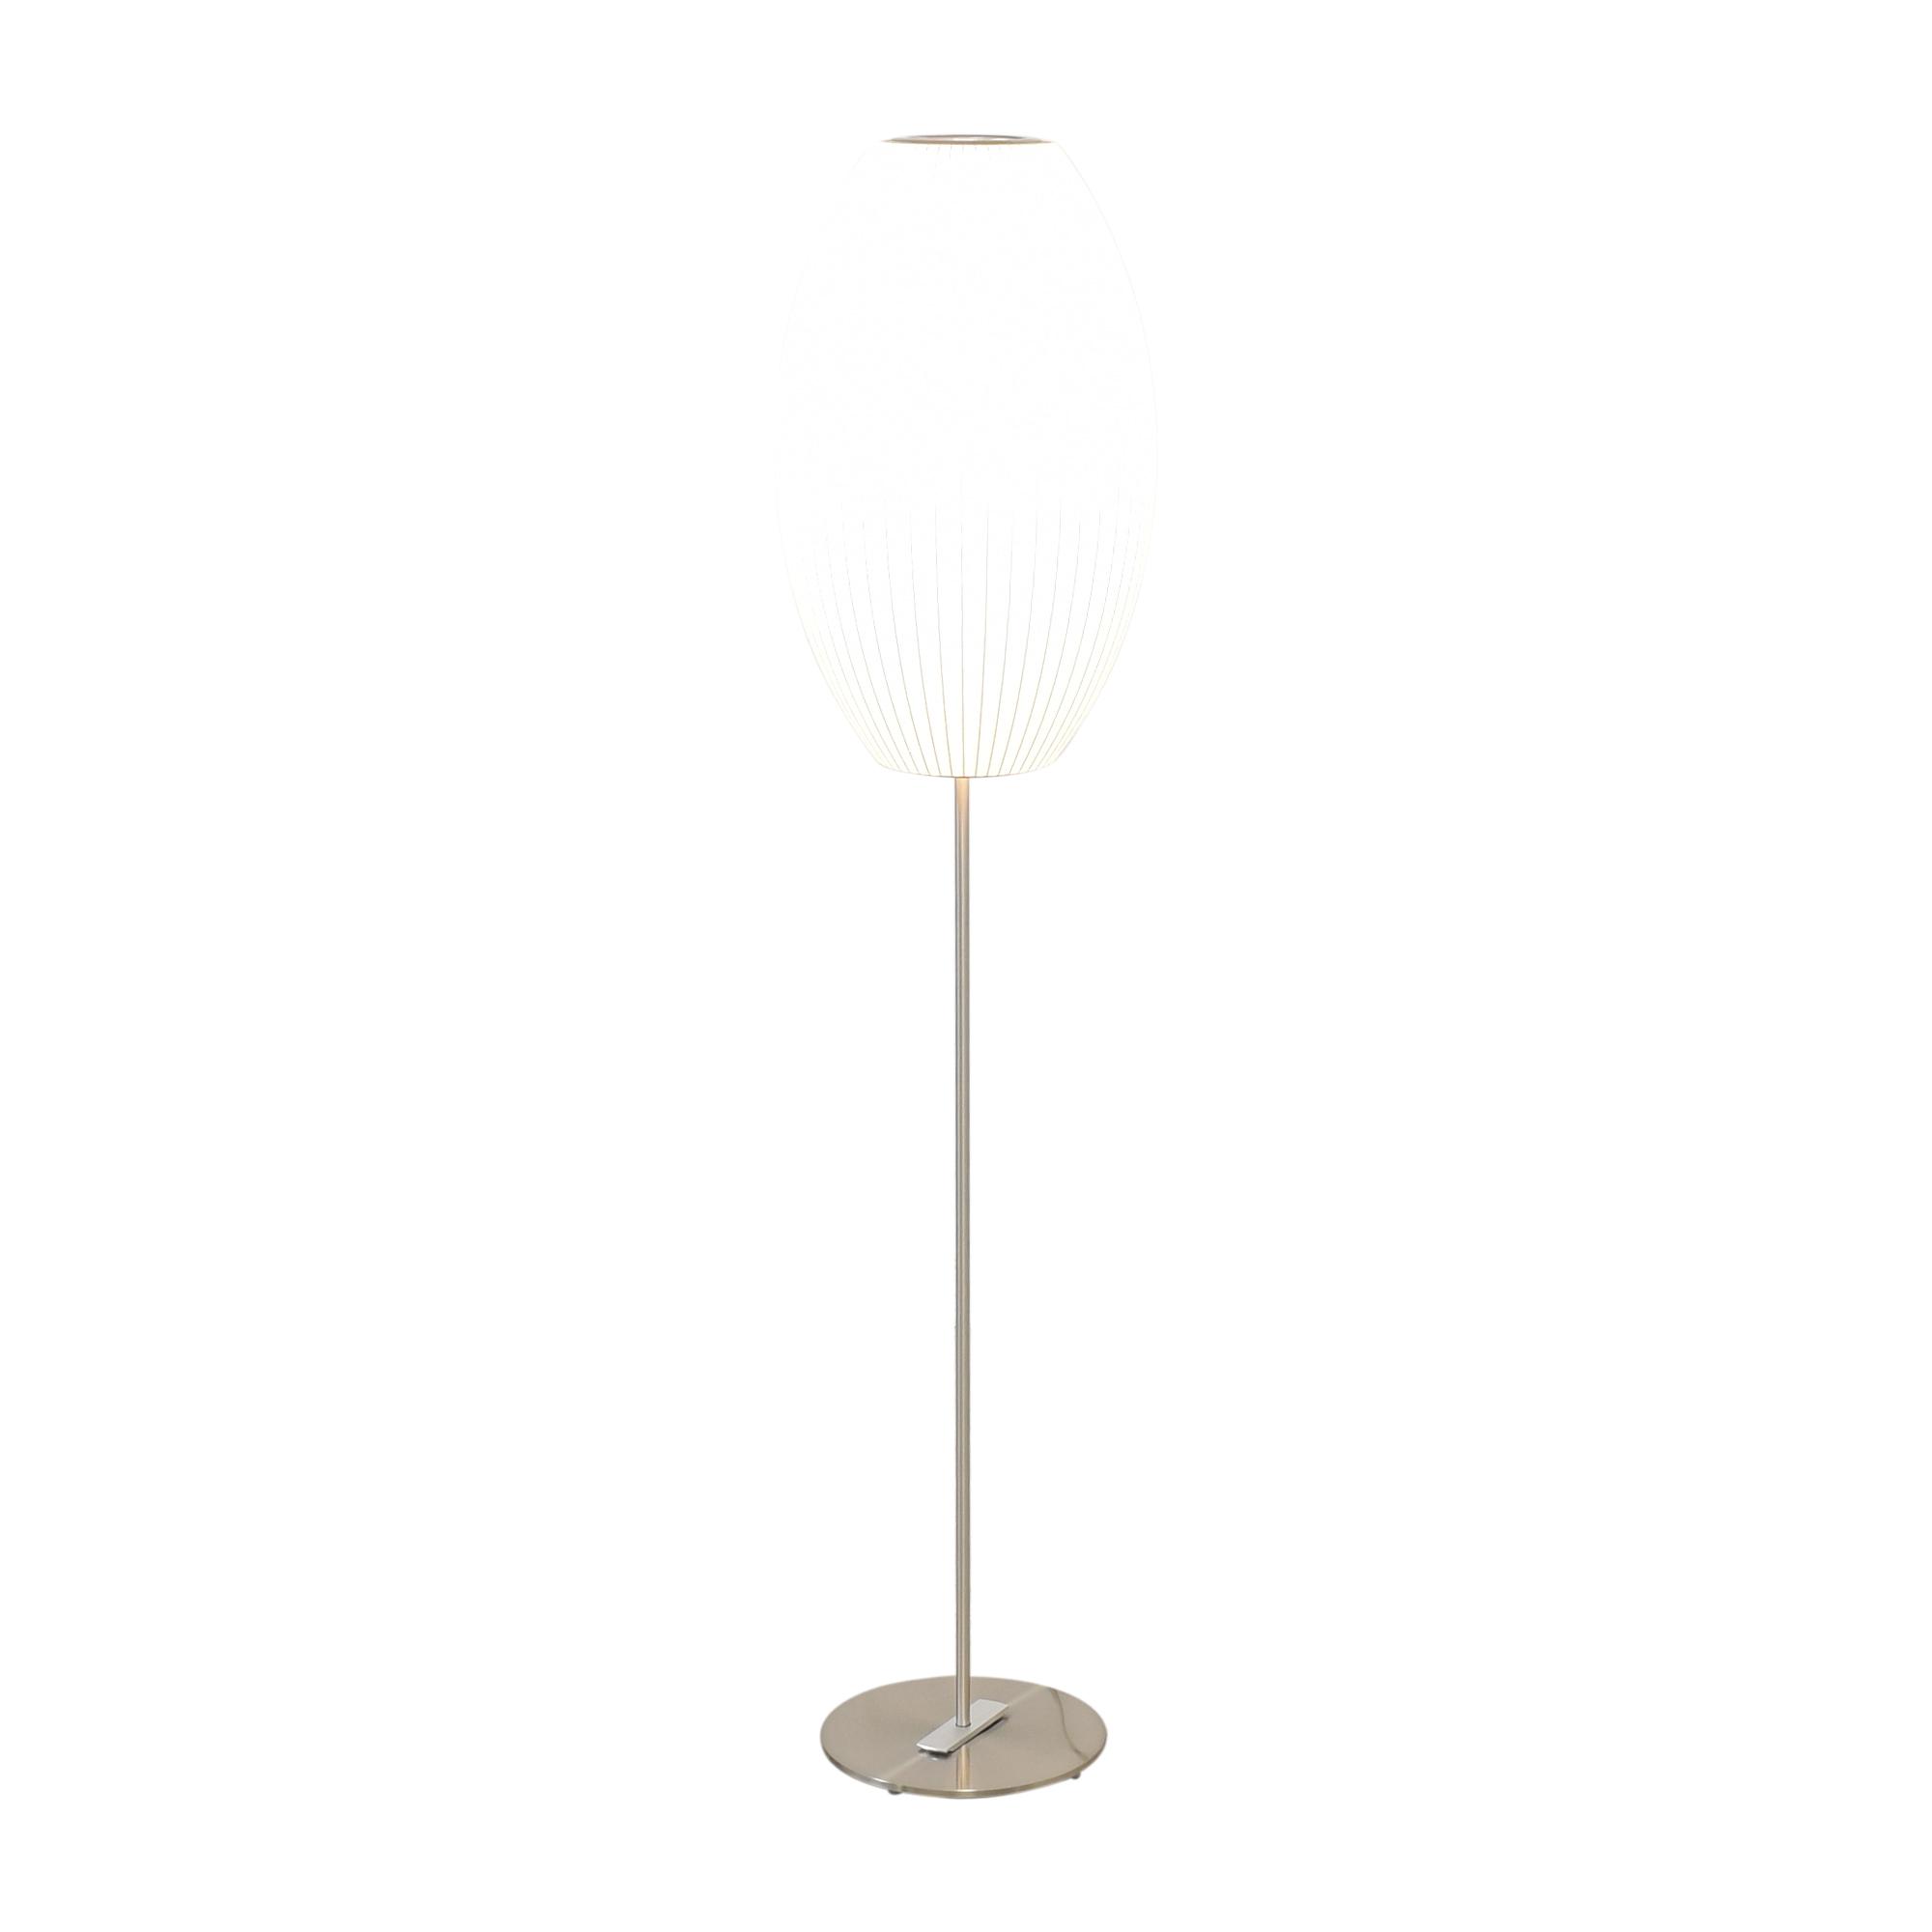 Modernica Modernica Nelson Bubble Lamps Cigar Lotus Floor Lamp price